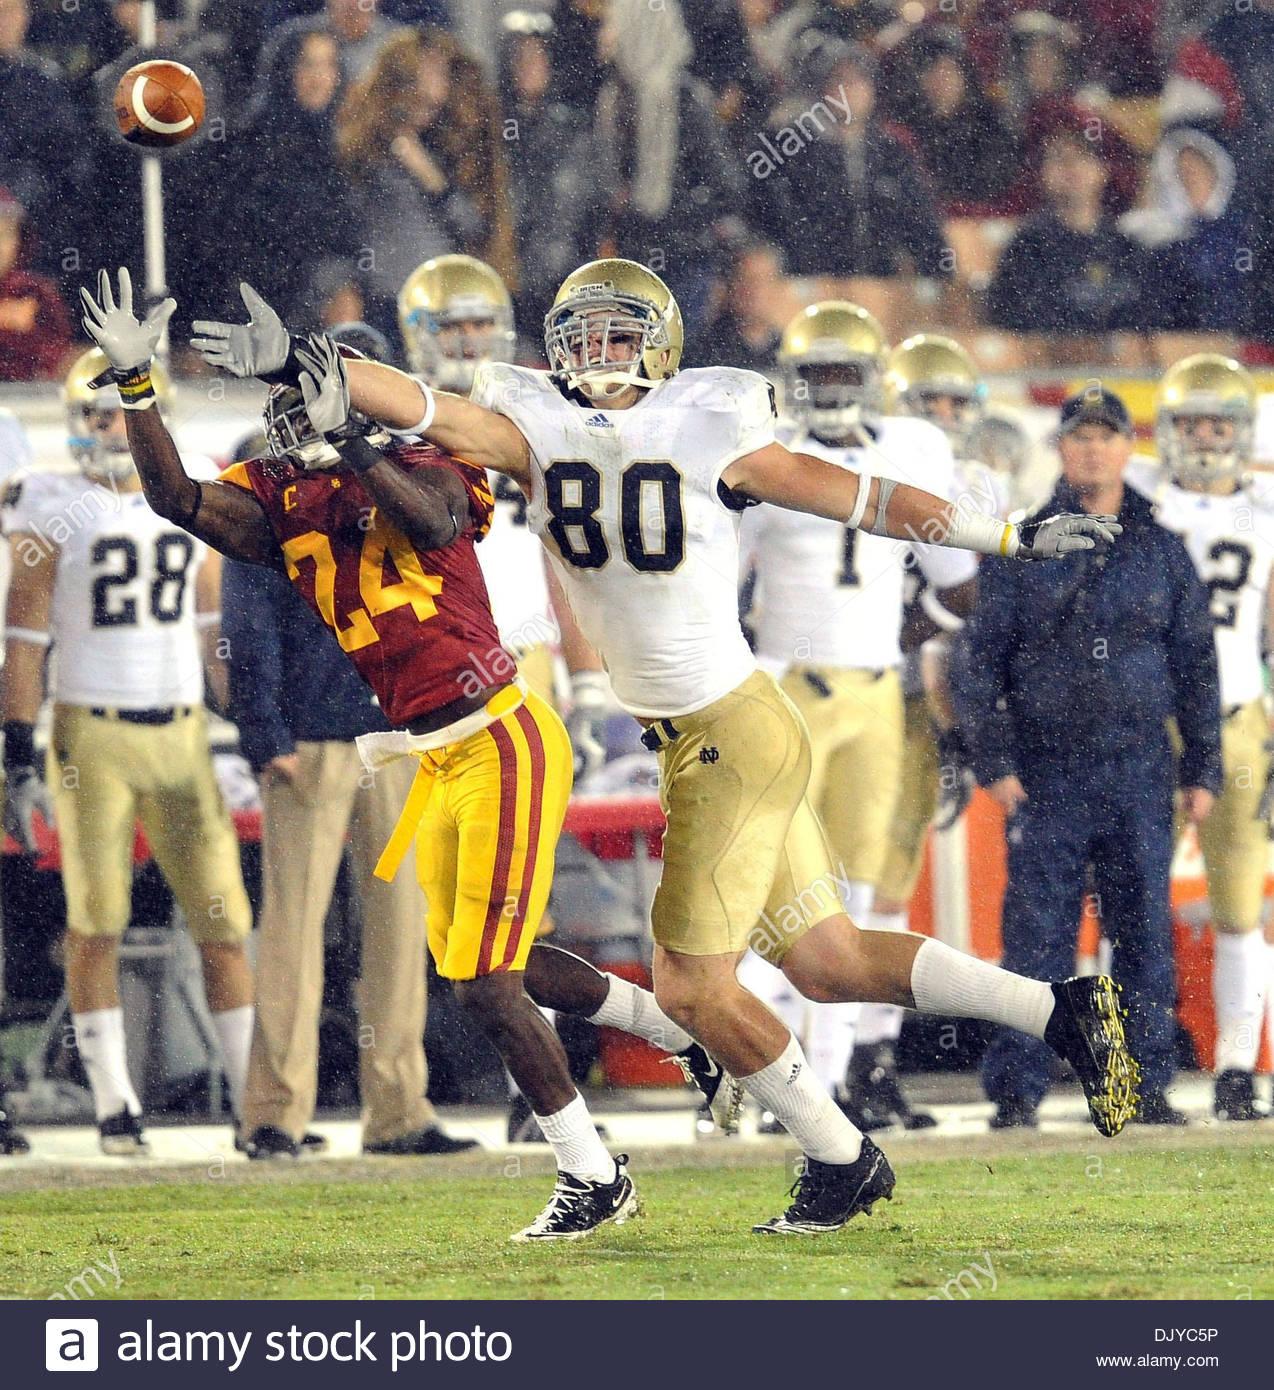 Nov 27, 2010 - Los Angeles, California, U.S. - Notre Dame's Tyler ...